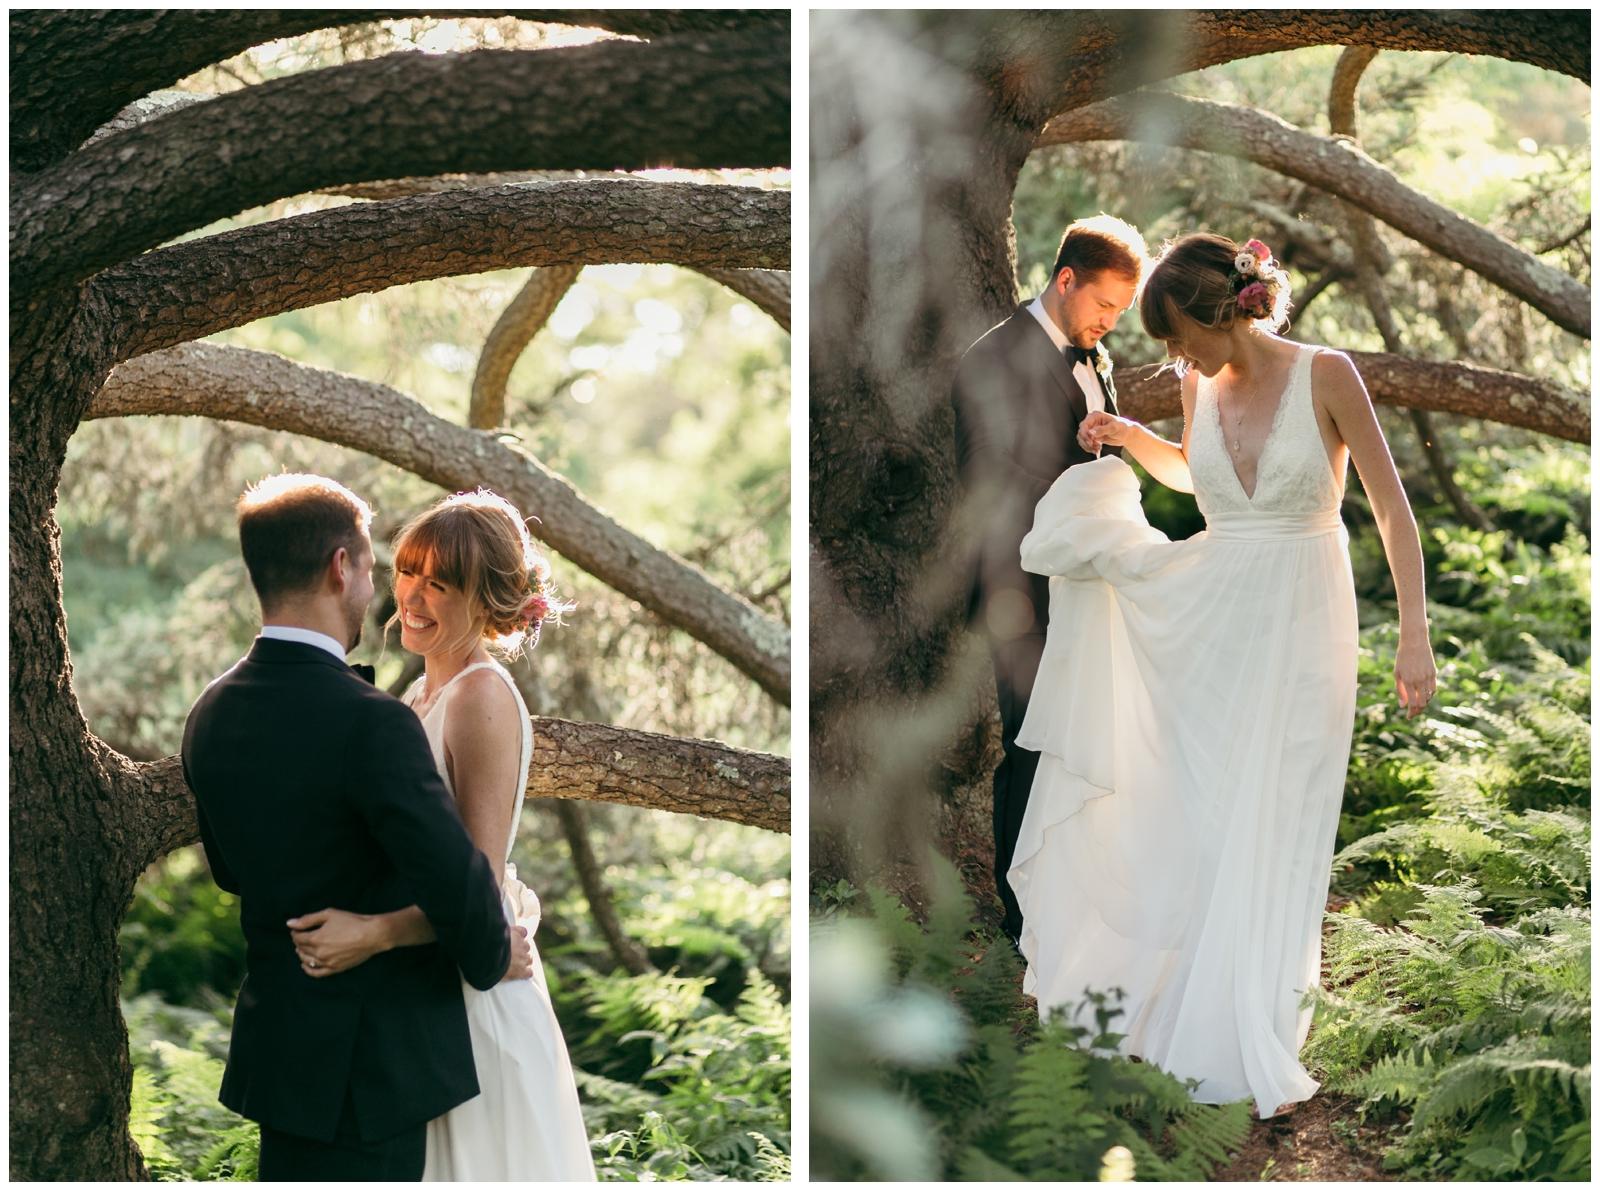 Moraine-Farm-wedding-Bailey-Q-Photo-Massachusetts-wedding-photpgrapher-105.jpg